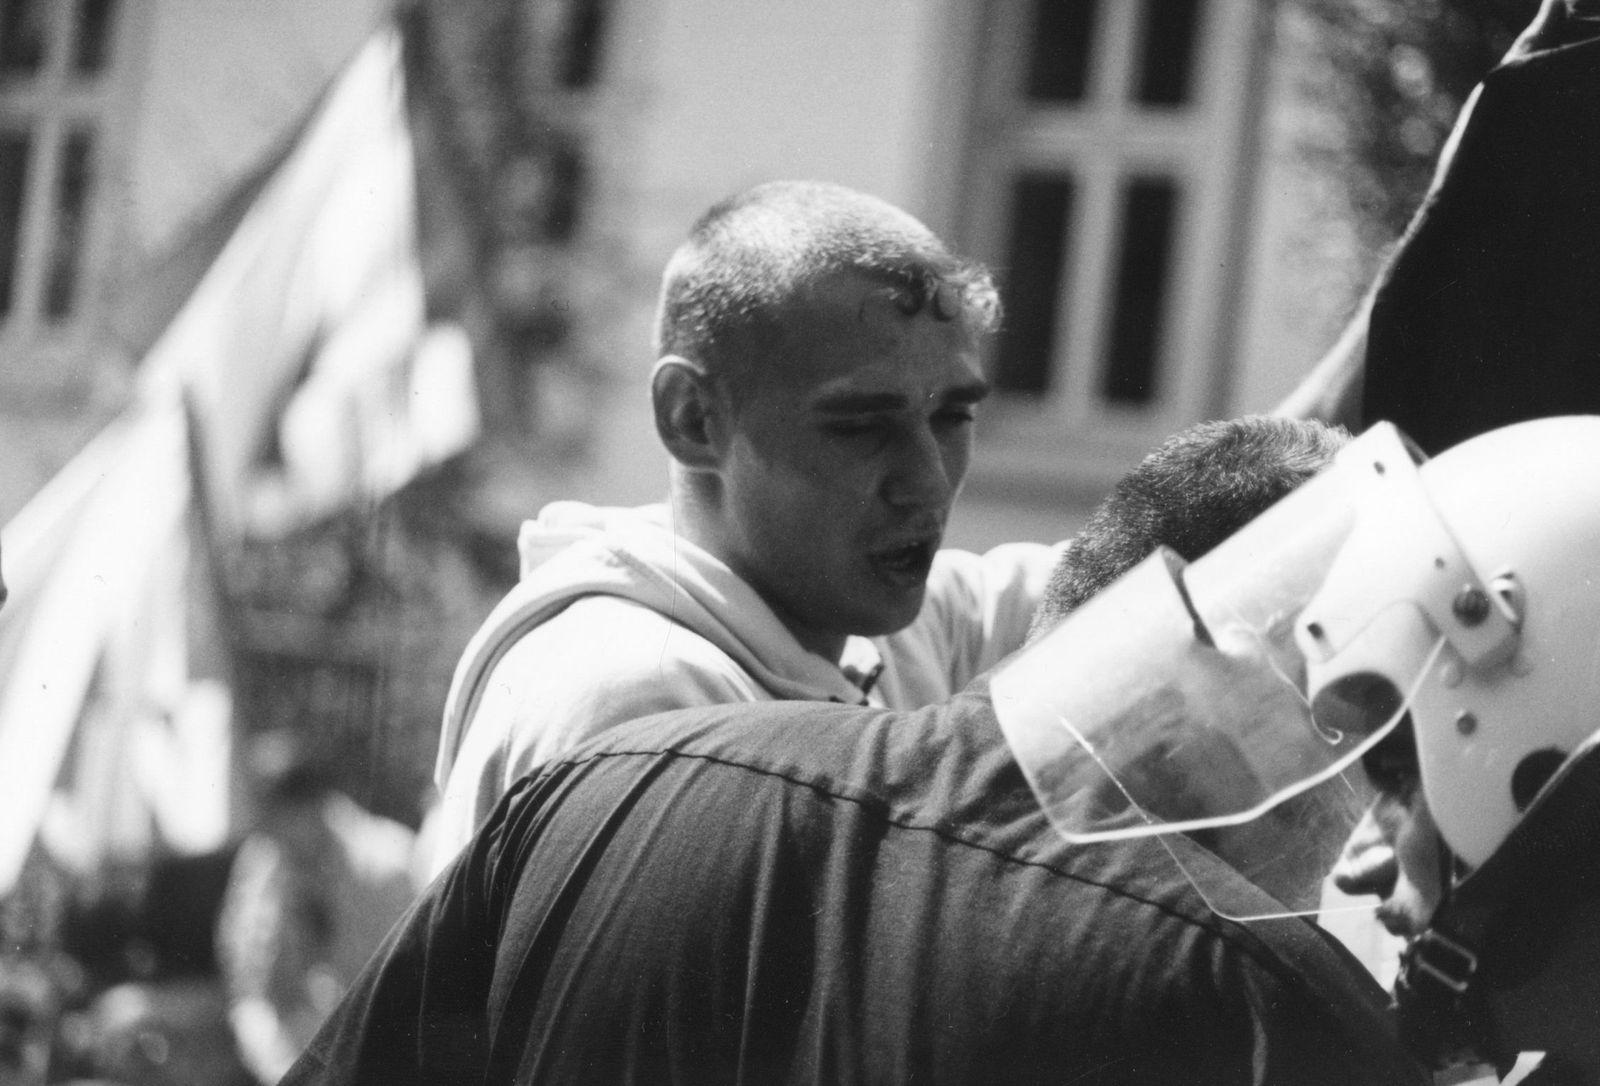 Rudolf Hess Demonstration Worms 1996 / NSU